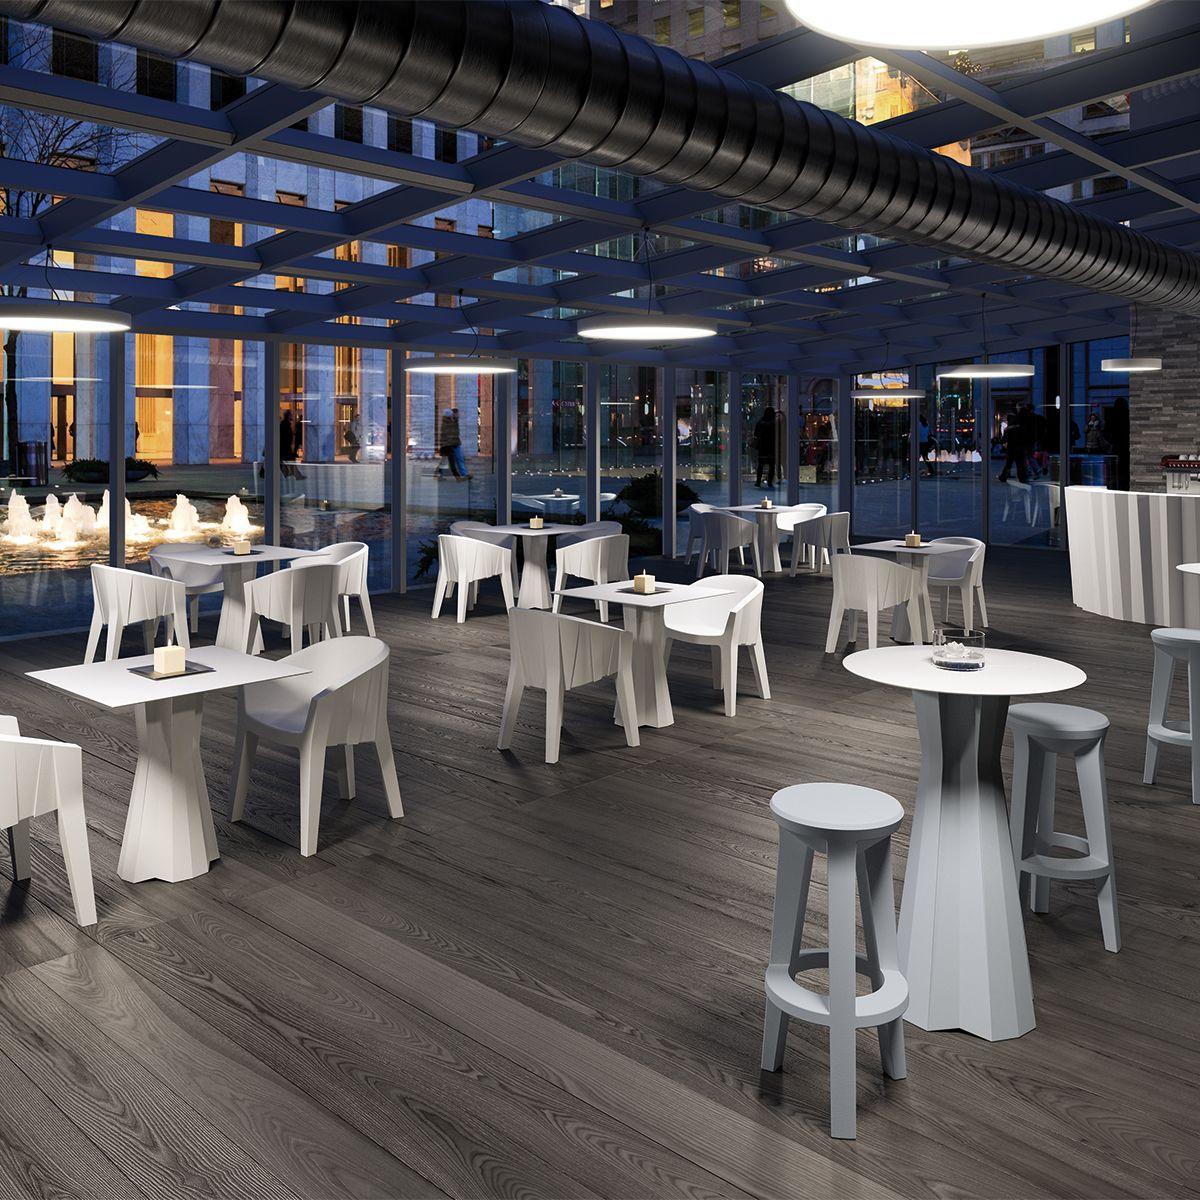 Sedute e tavoli in plastica indoor outdoor bianca e colorata - Tavoli e sedie in plastica ...